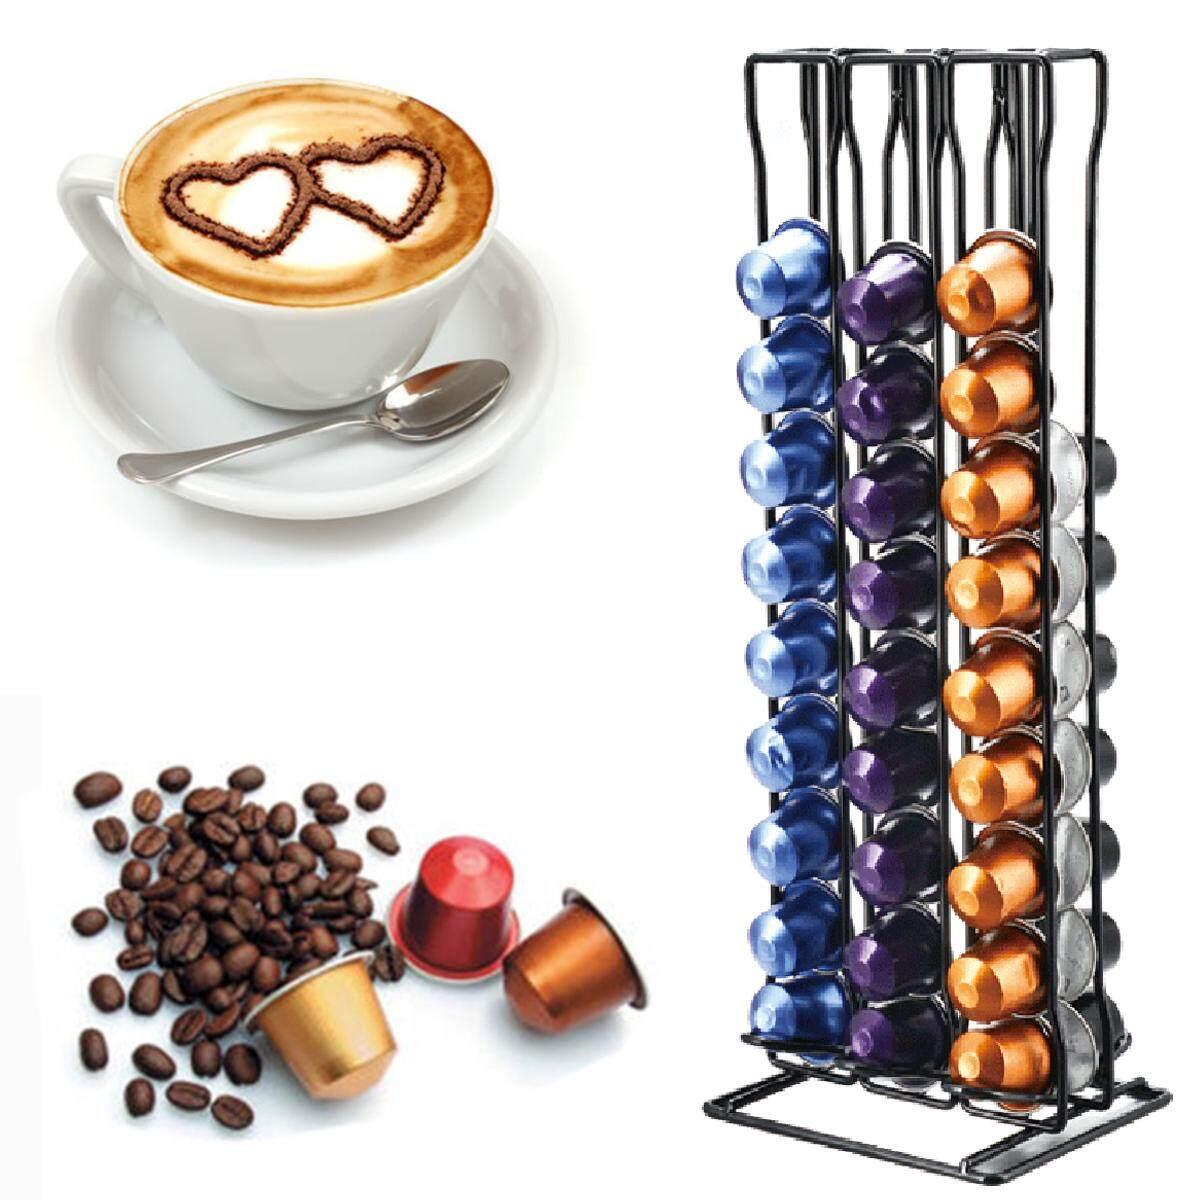 b5747dd43b7 Buy Latest Coffee Capsule Holders Online | Lazada